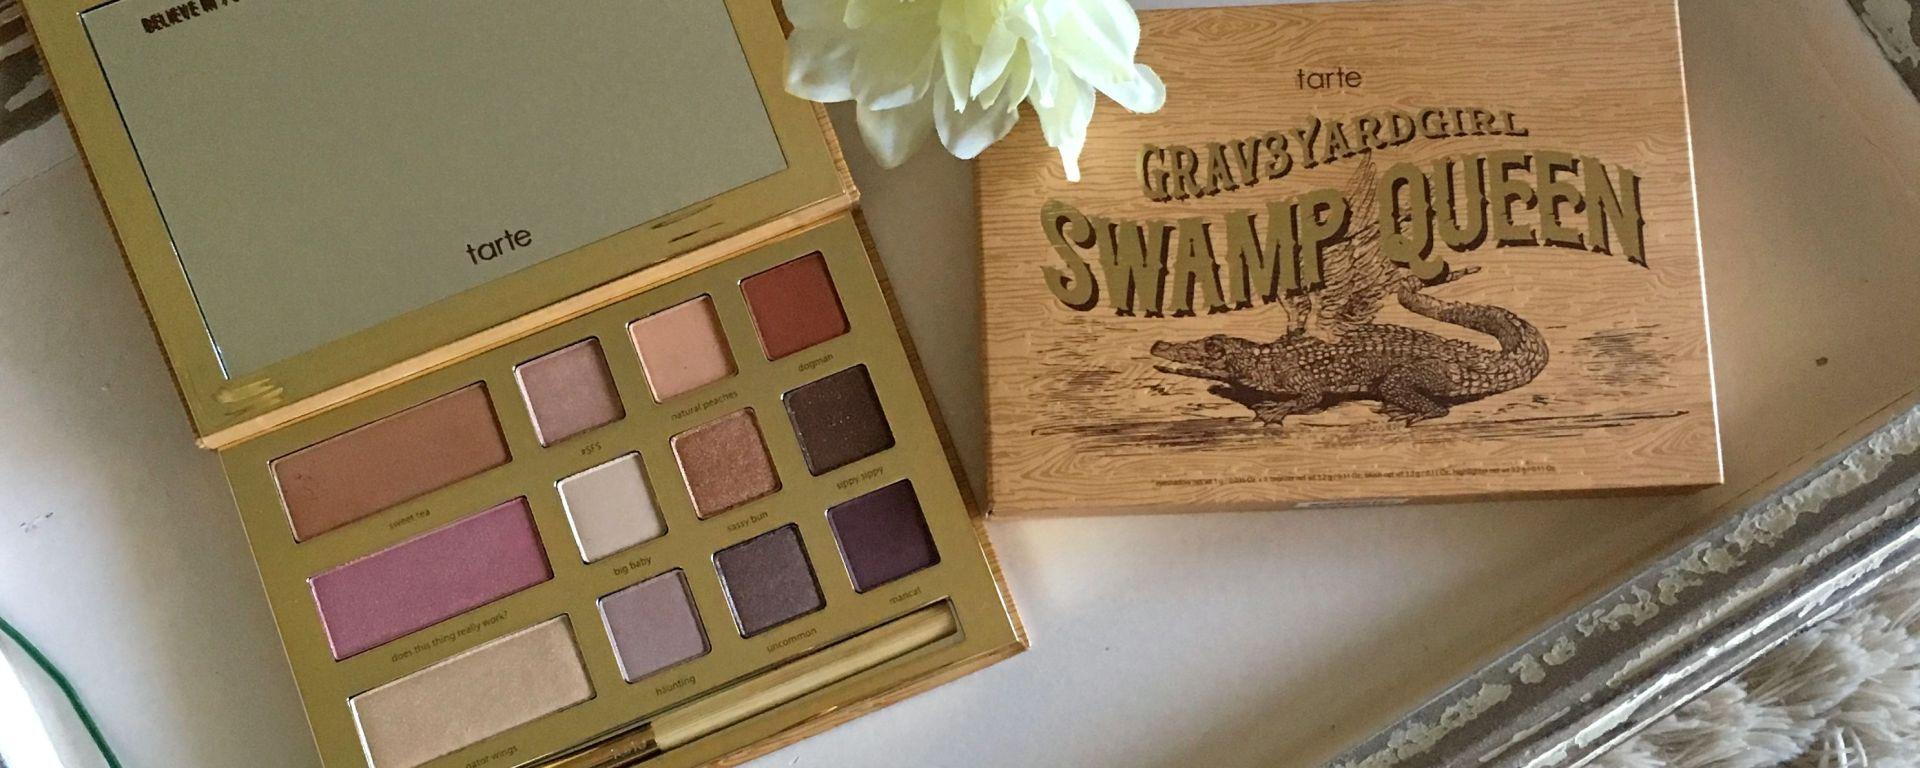 Swamp Queen Tarte Palette A Whimsical Tale Of Wanderlust